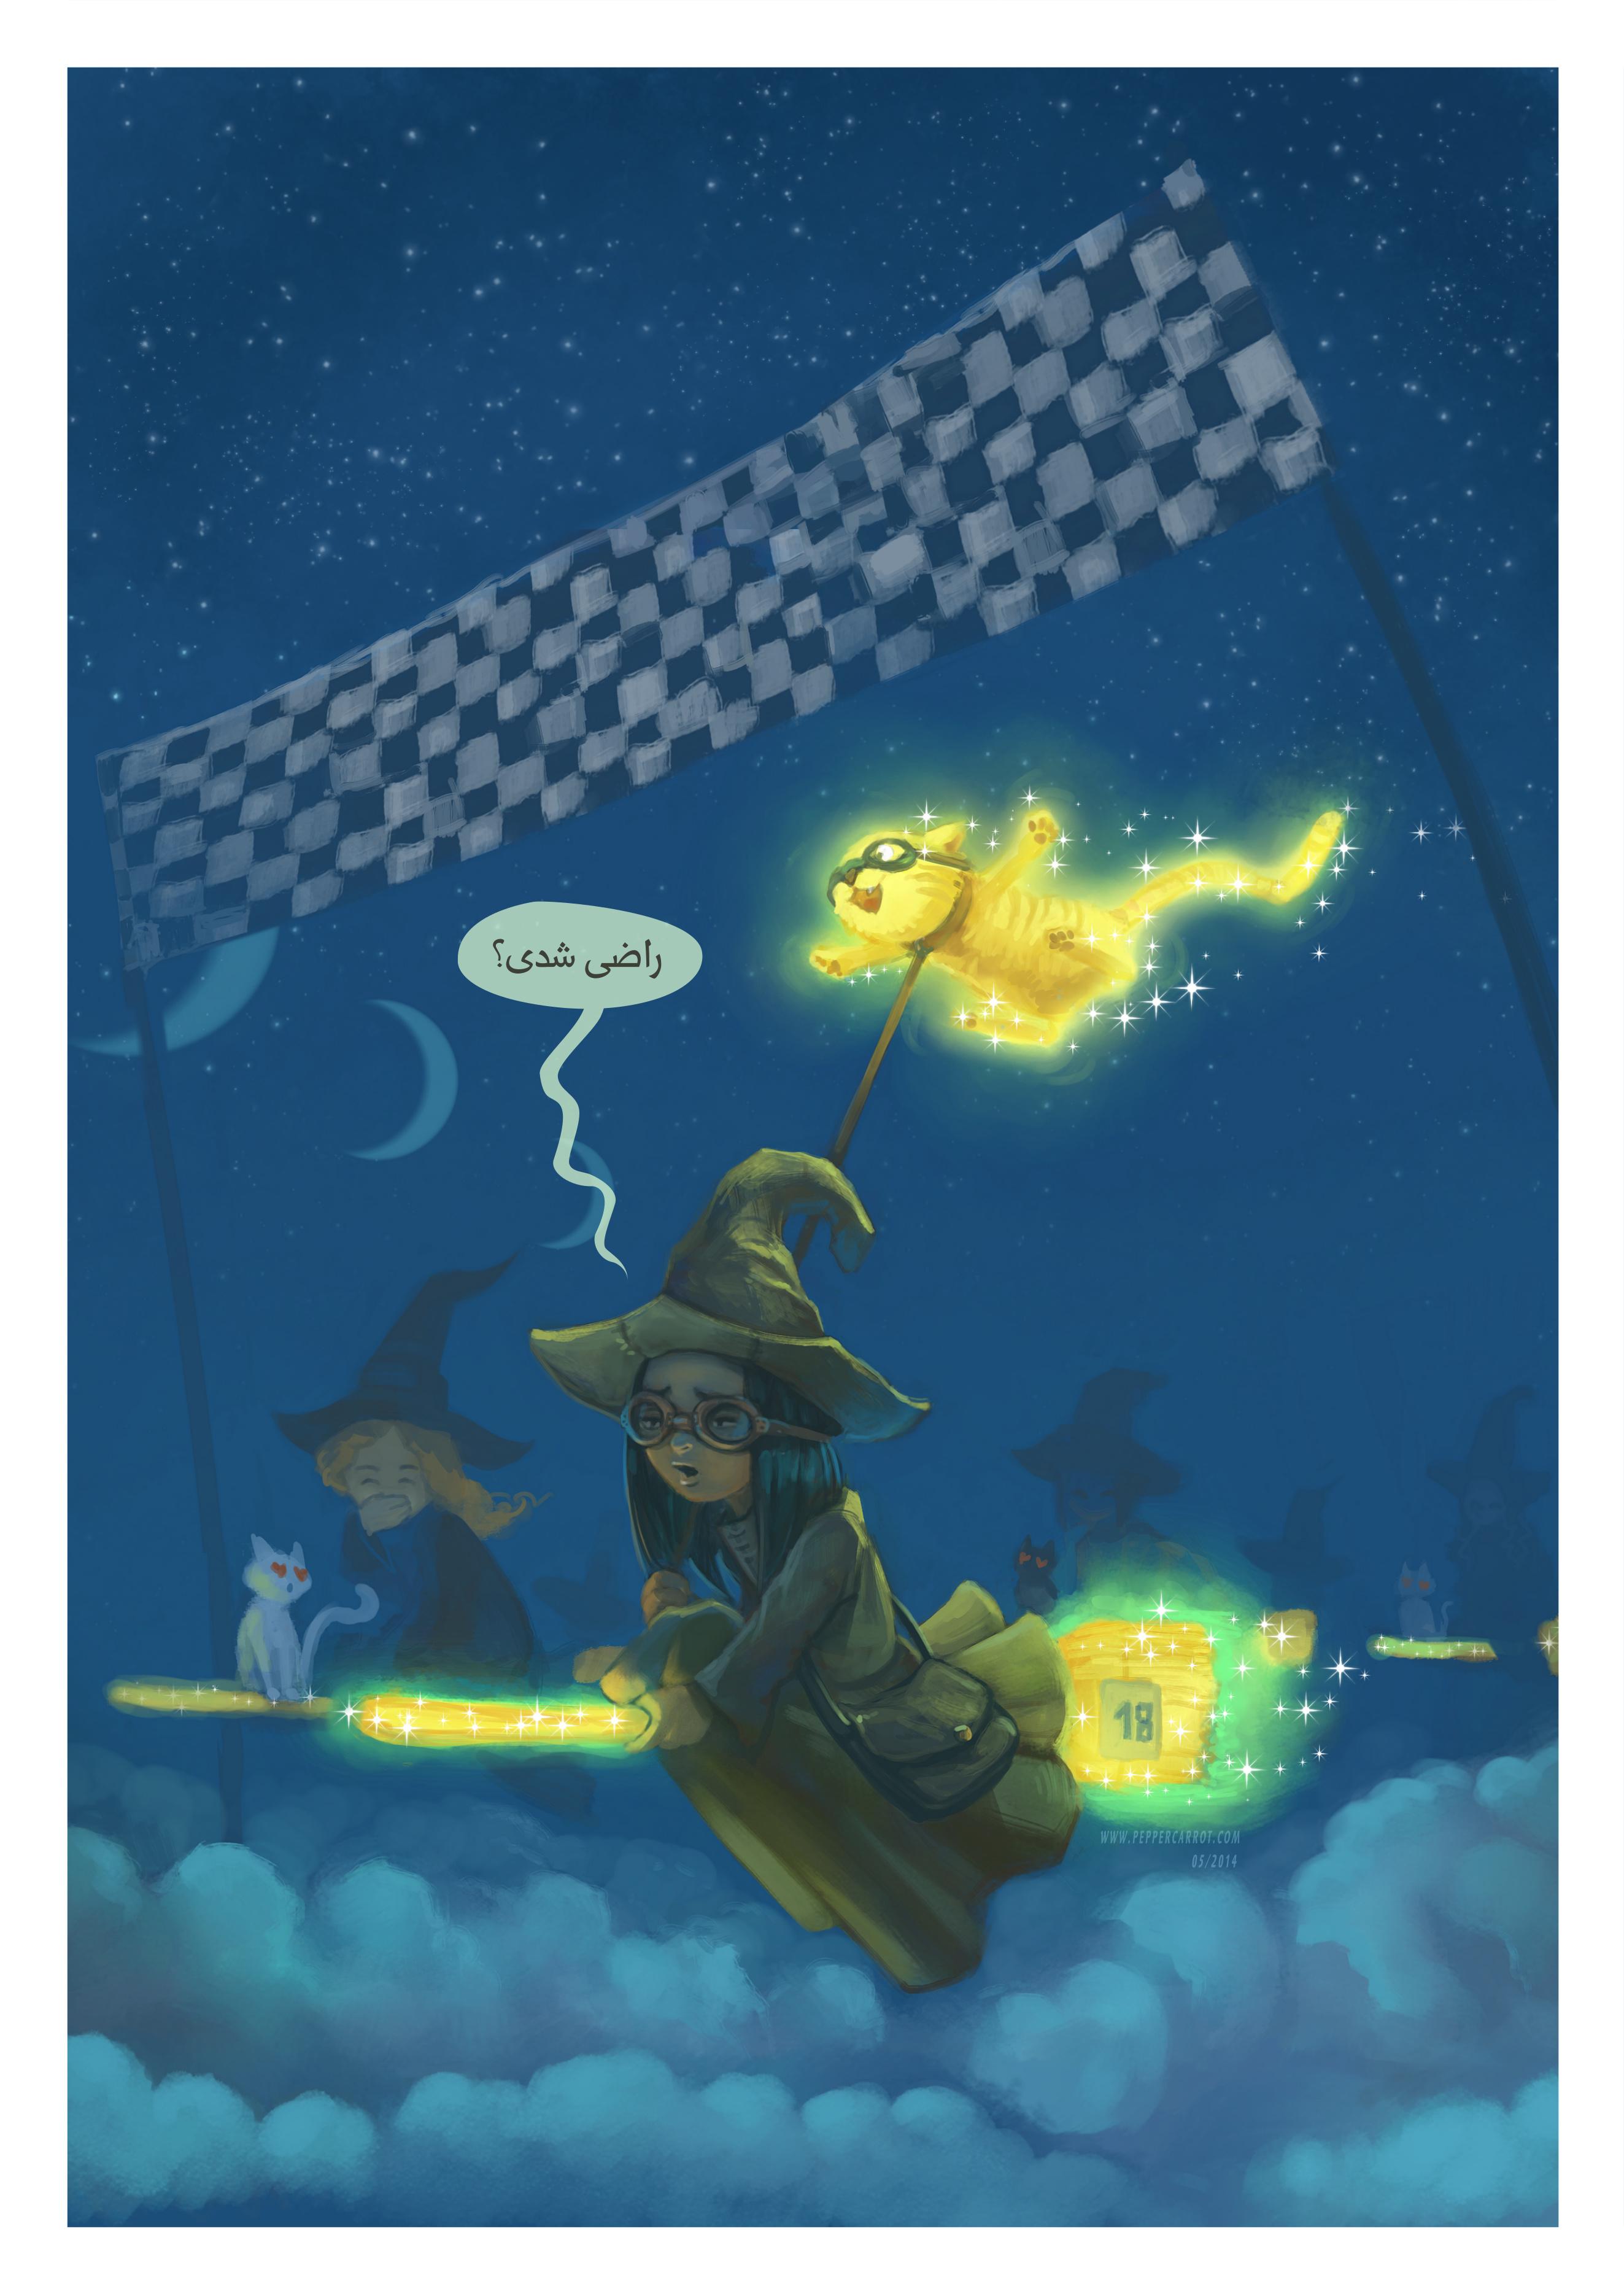 قسمت اول: معجون پرواز, Page 3